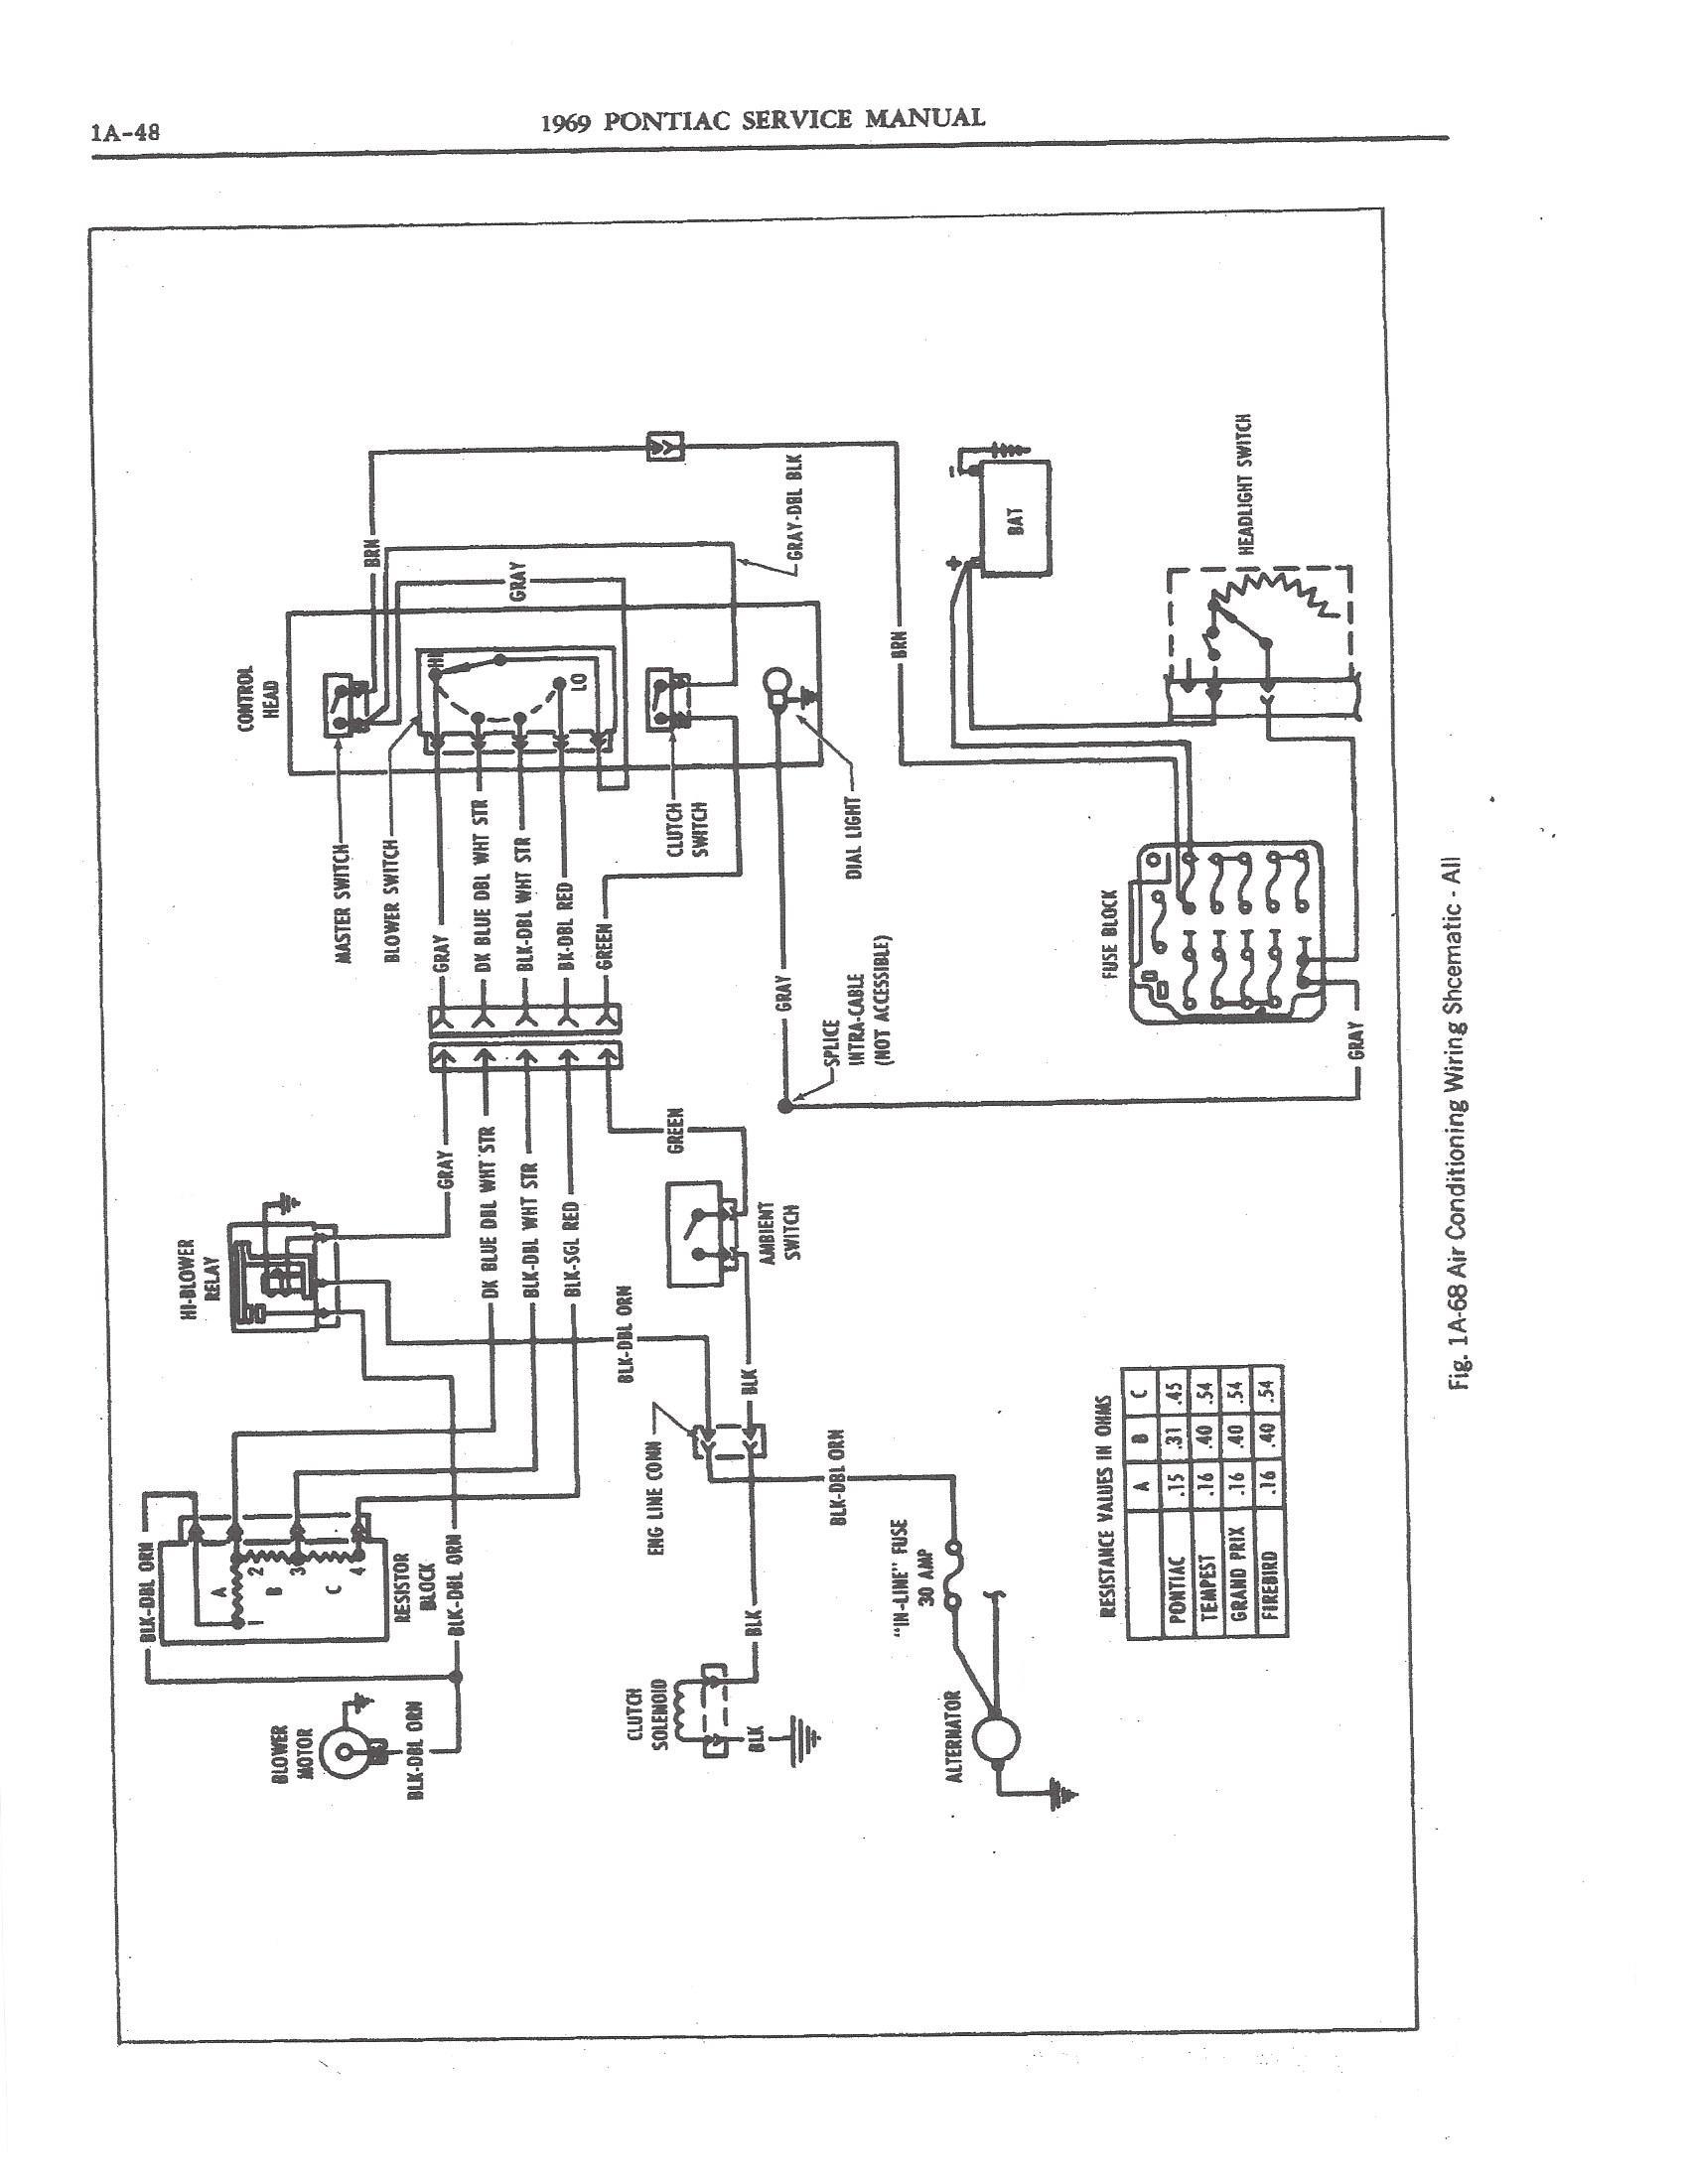 1969 Pontiac Gto Wiring Diagram Mack Granite Wiring Diagram Ignition Begeboy Wiring Diagram Source